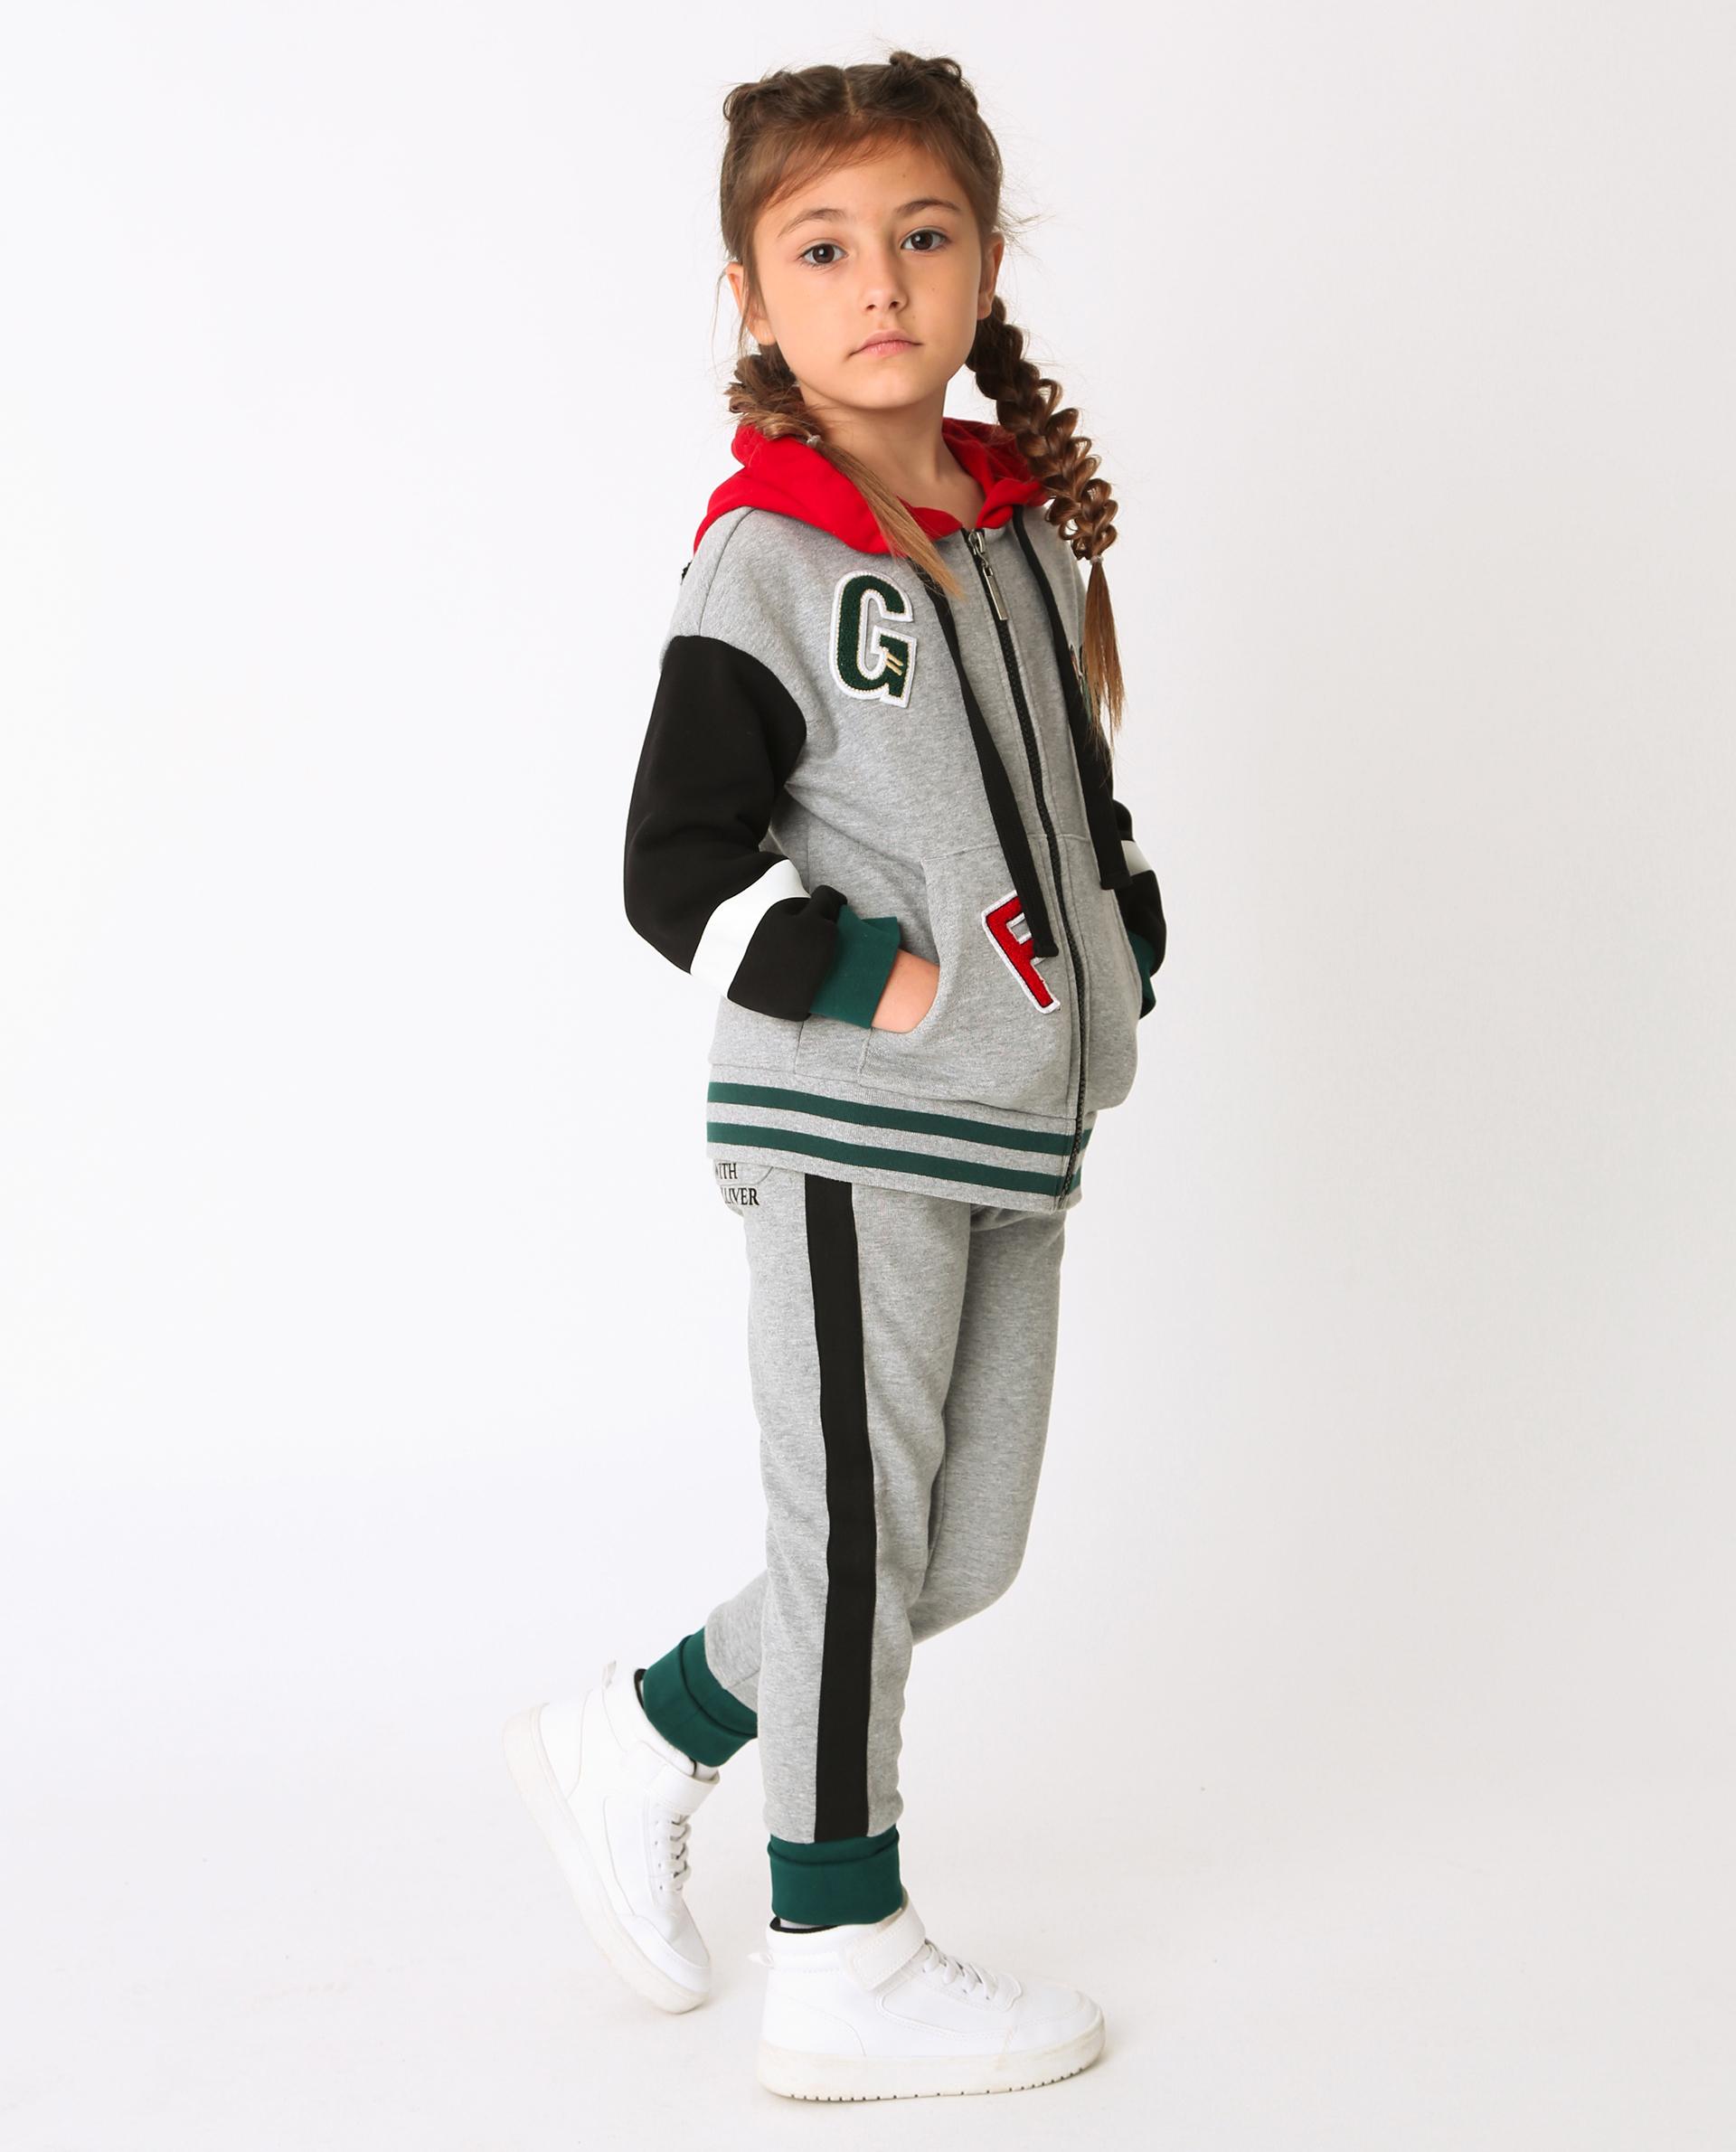 Купить 22002GMC5601, Серые брюки Gulliver, серый, 104, Футер, Женский, Демисезон, ОСЕНЬ/ЗИМА 2020-2021 (shop: GulliverMarket Gulliver Market)